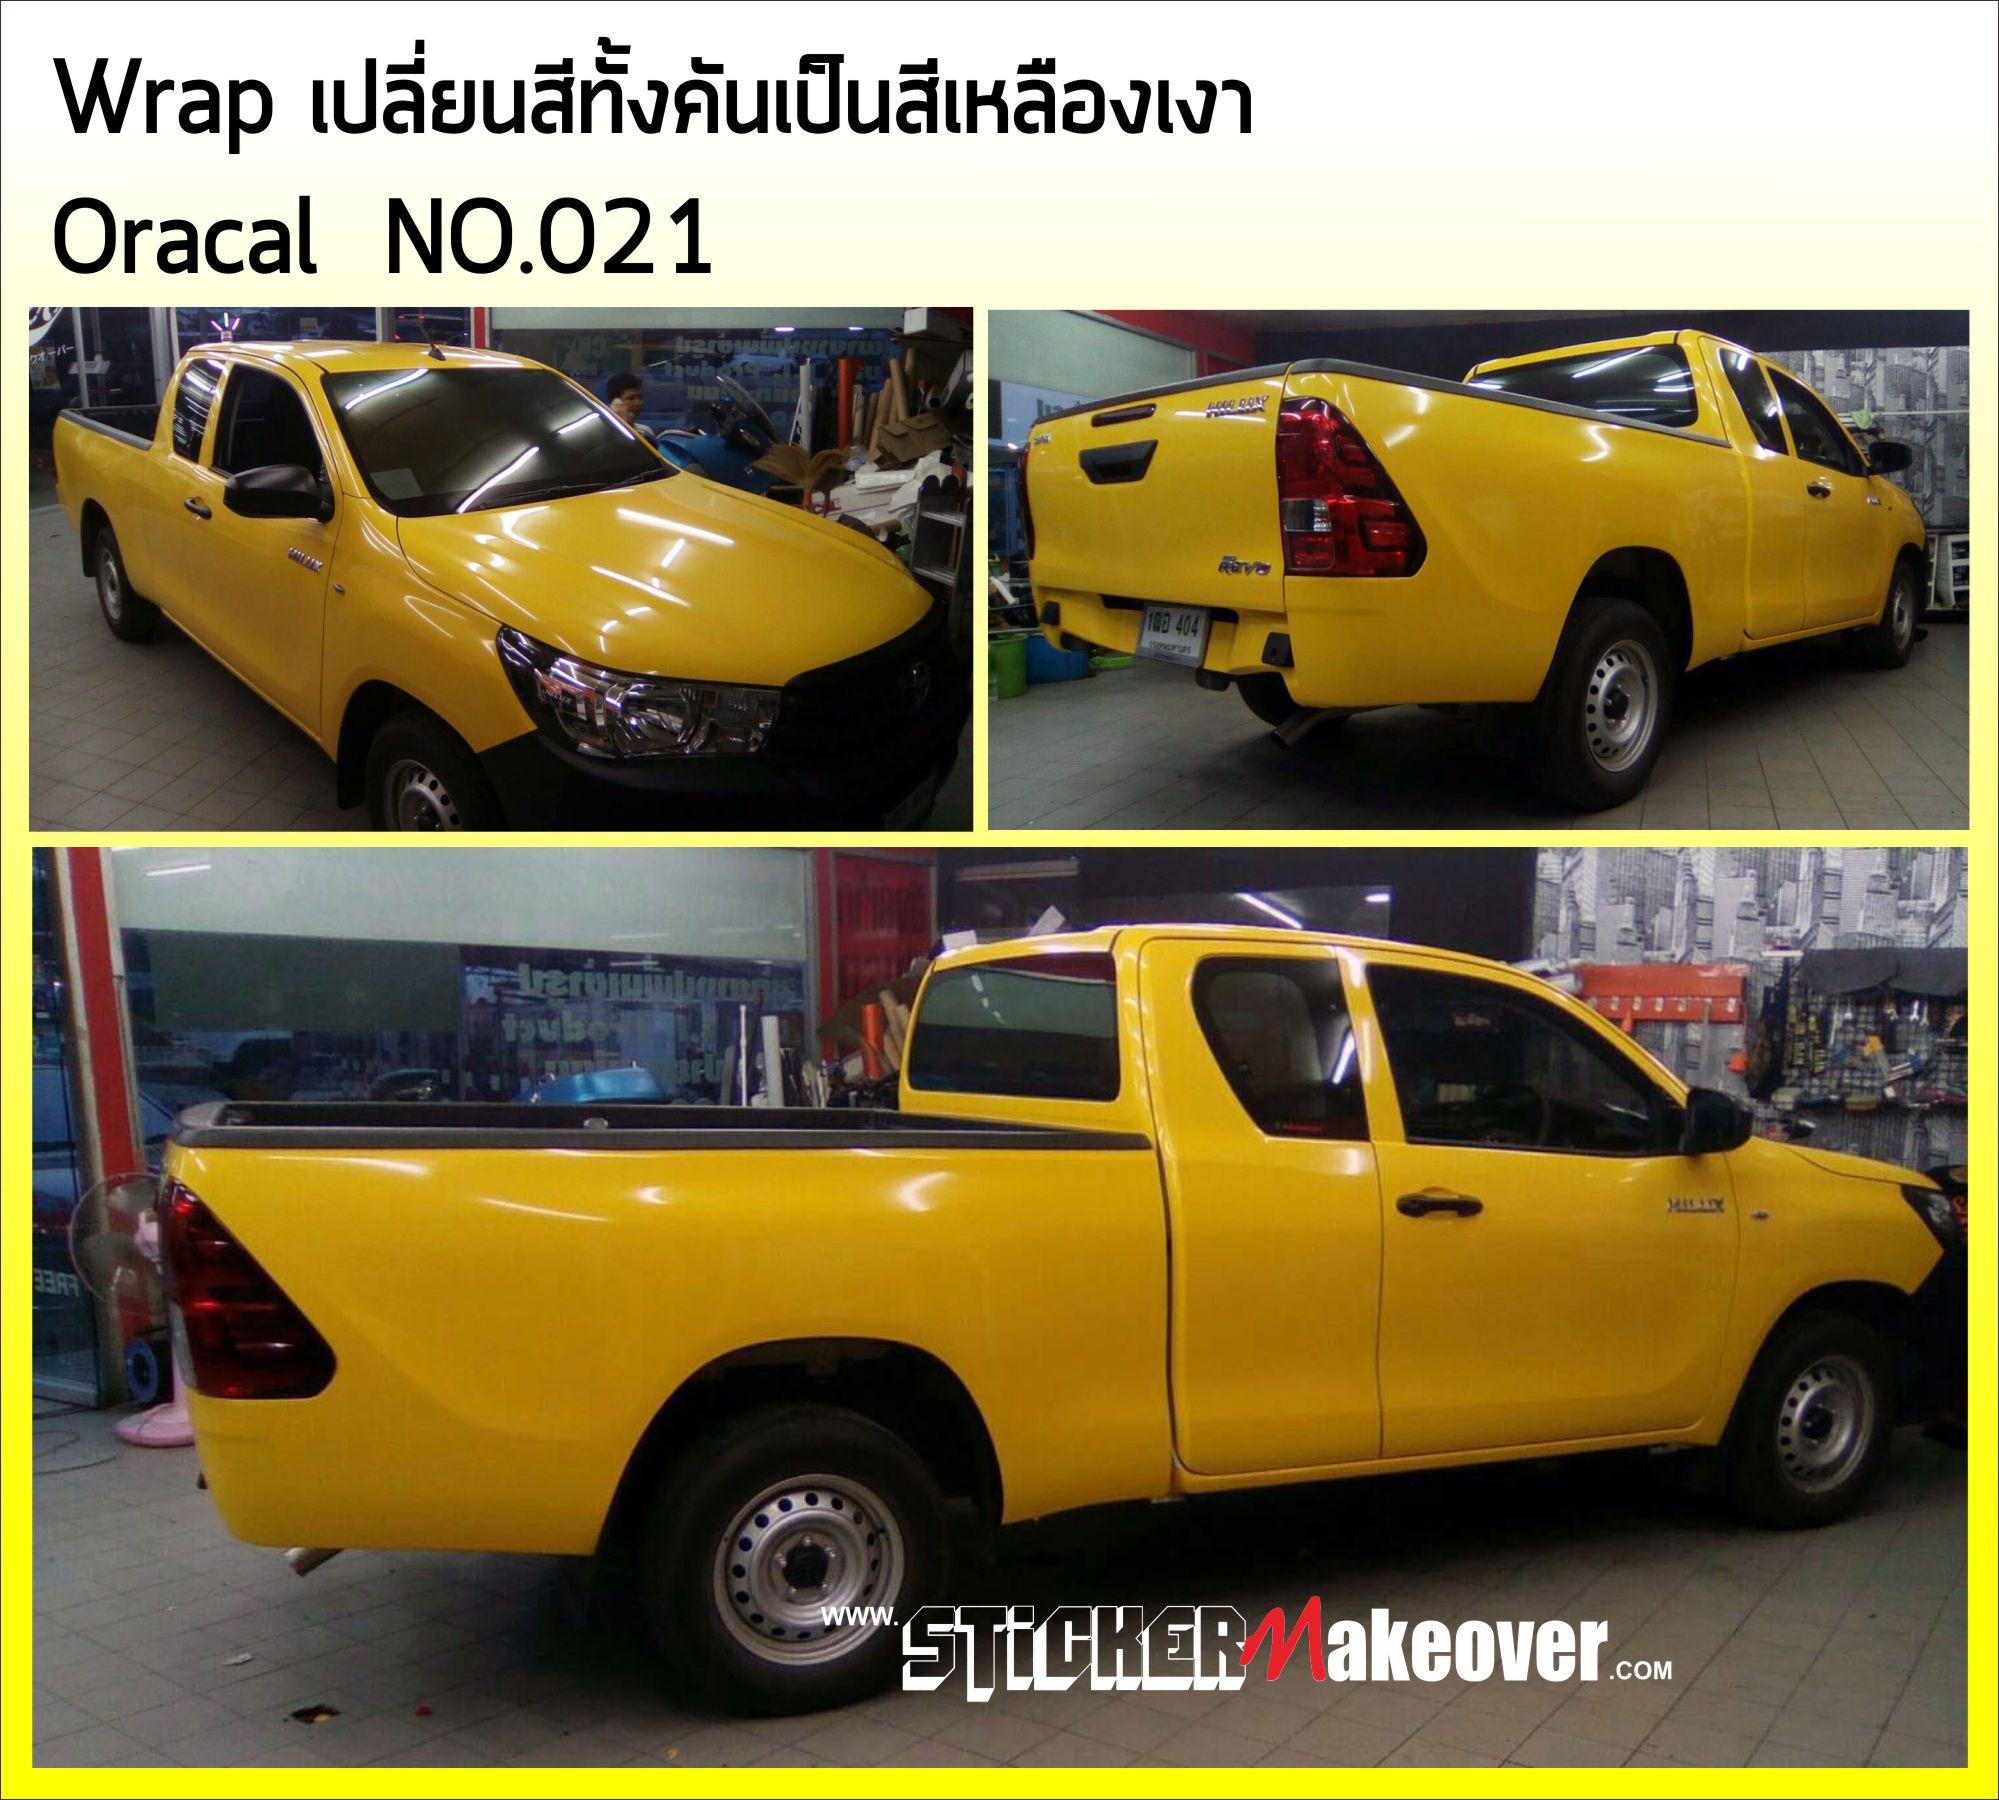 wrap car ฟิล์มหุ้มเปลี่ยนสีรถ wrap toyota REVO สีเหลือง เปลี่ยนสีรถทั้งคันด้วยสติกเกอร์ wrapเปลี่ยนสีรถ